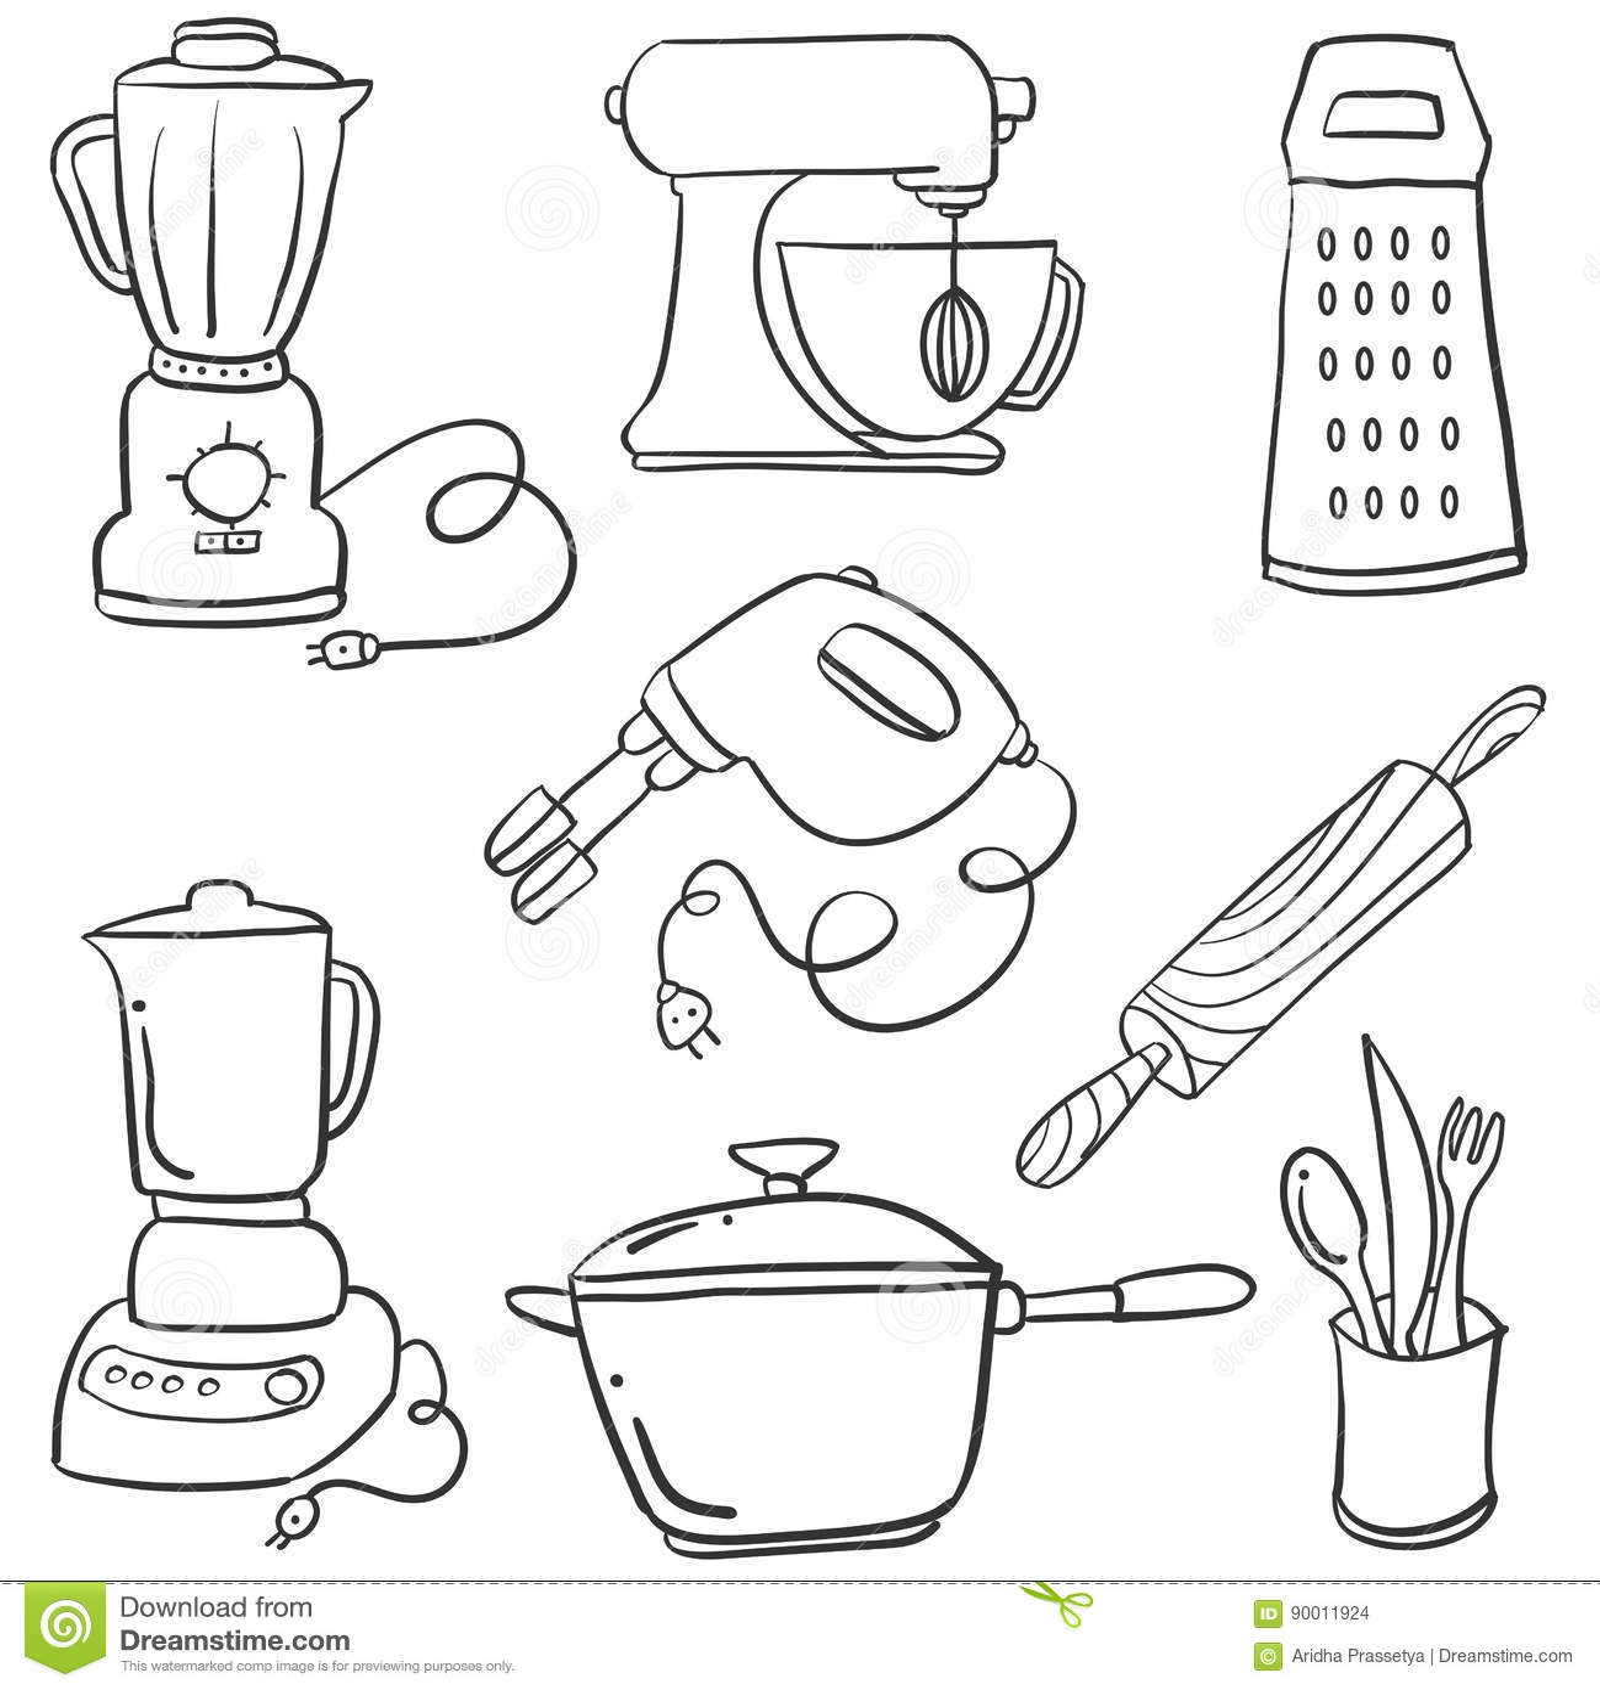 Doodle Kitchen Set Vector Art Stock Vector Illustration Of Cutlery